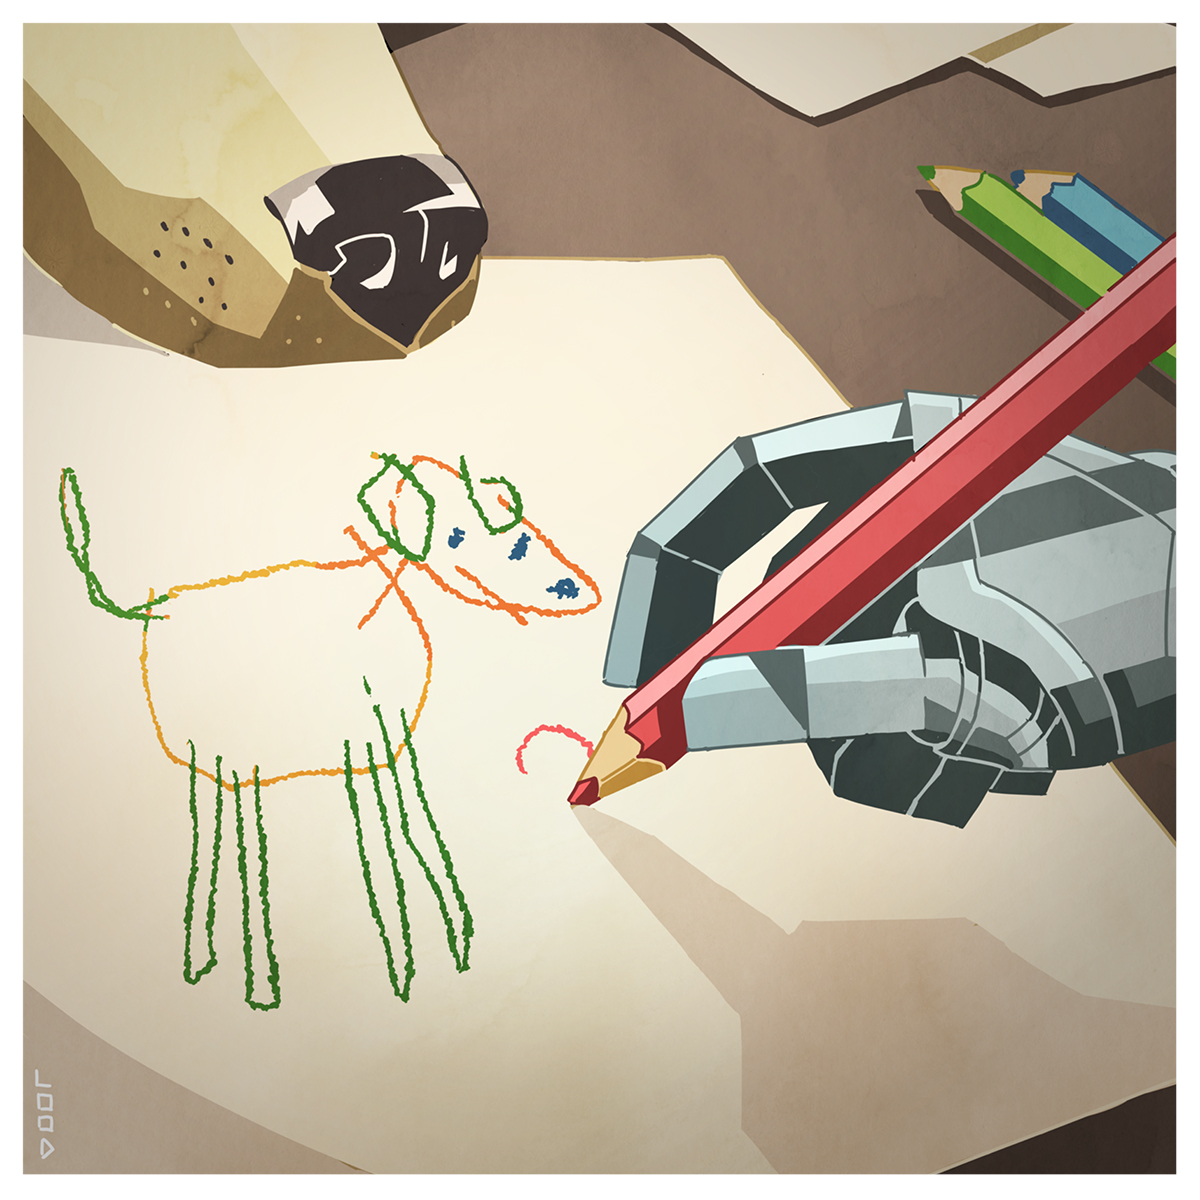 02_Drawing_color.jpg